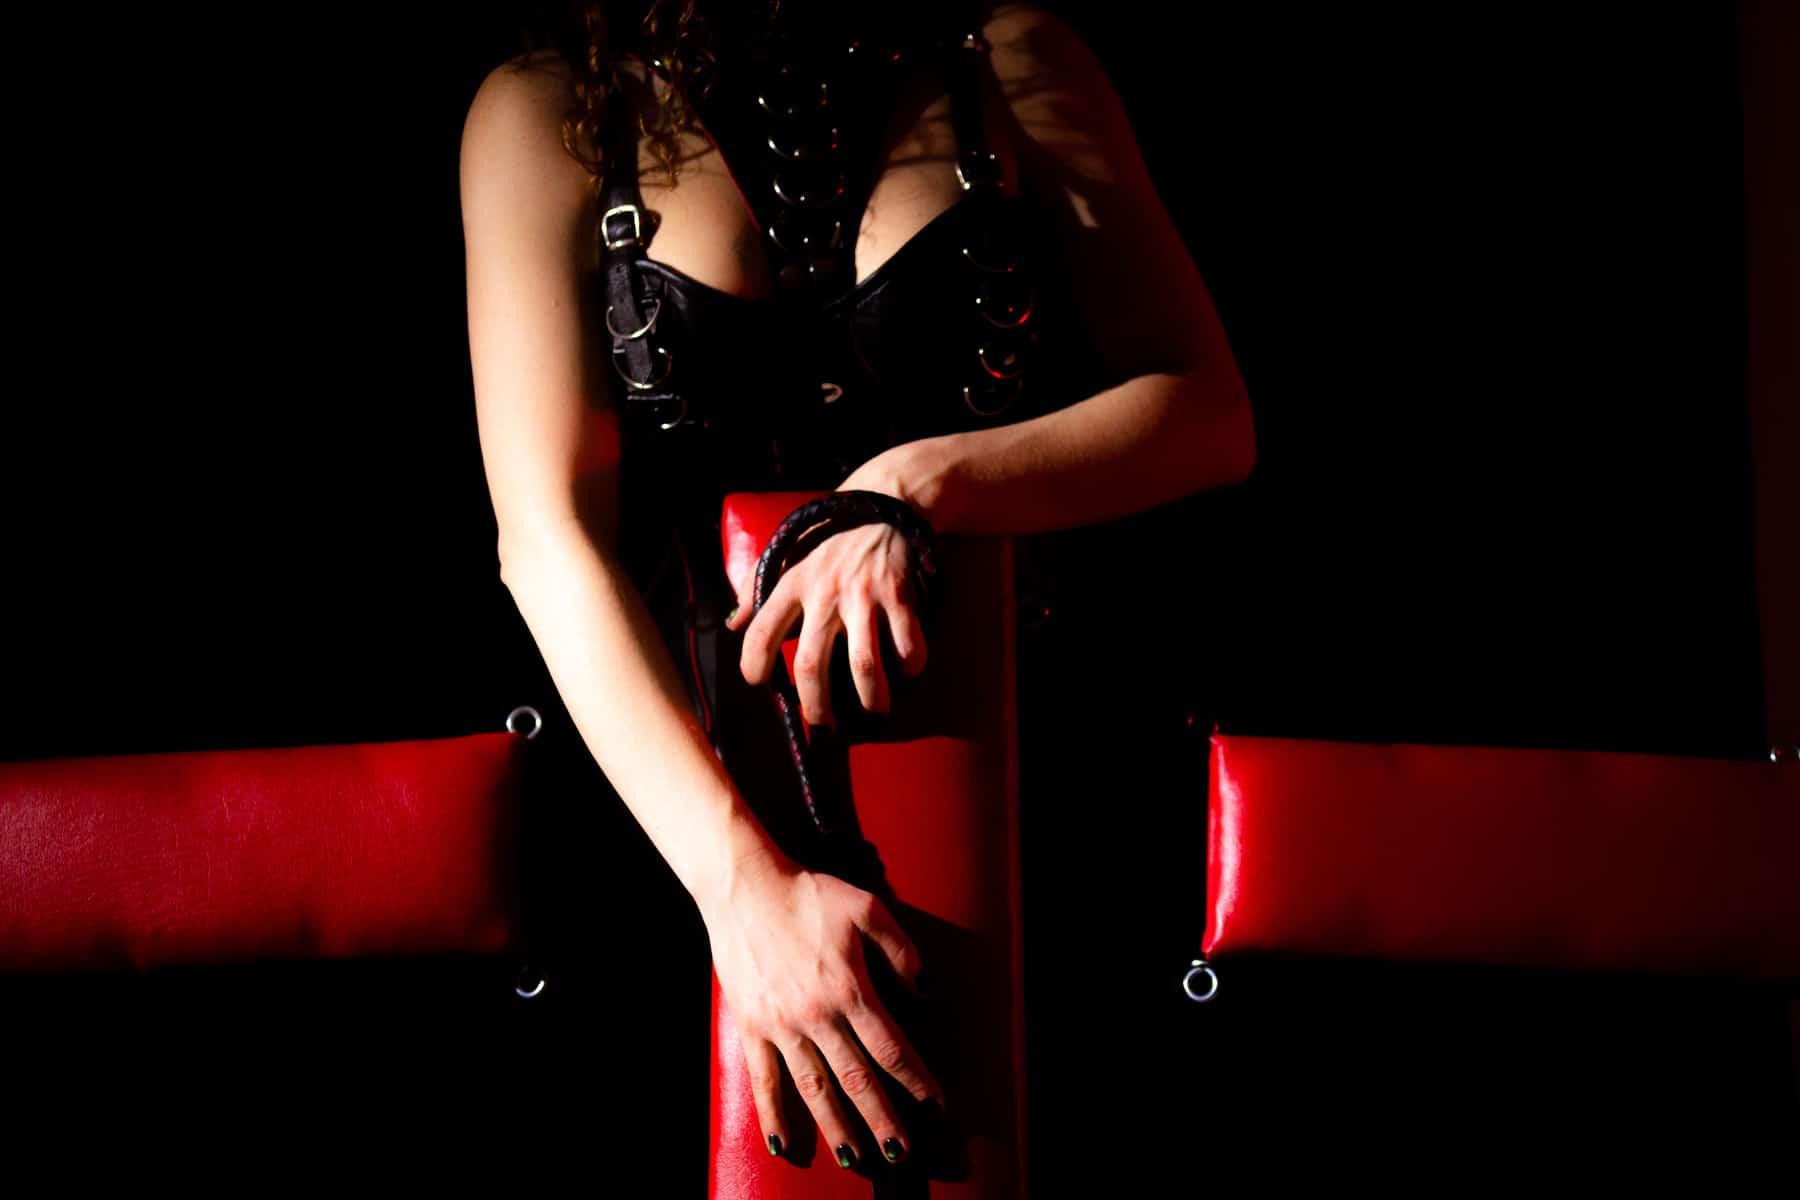 chicago dominatrix CBT chair torture cock ball torture leather corset dominatrix leather whip single tail bdsm furniture dungeon den